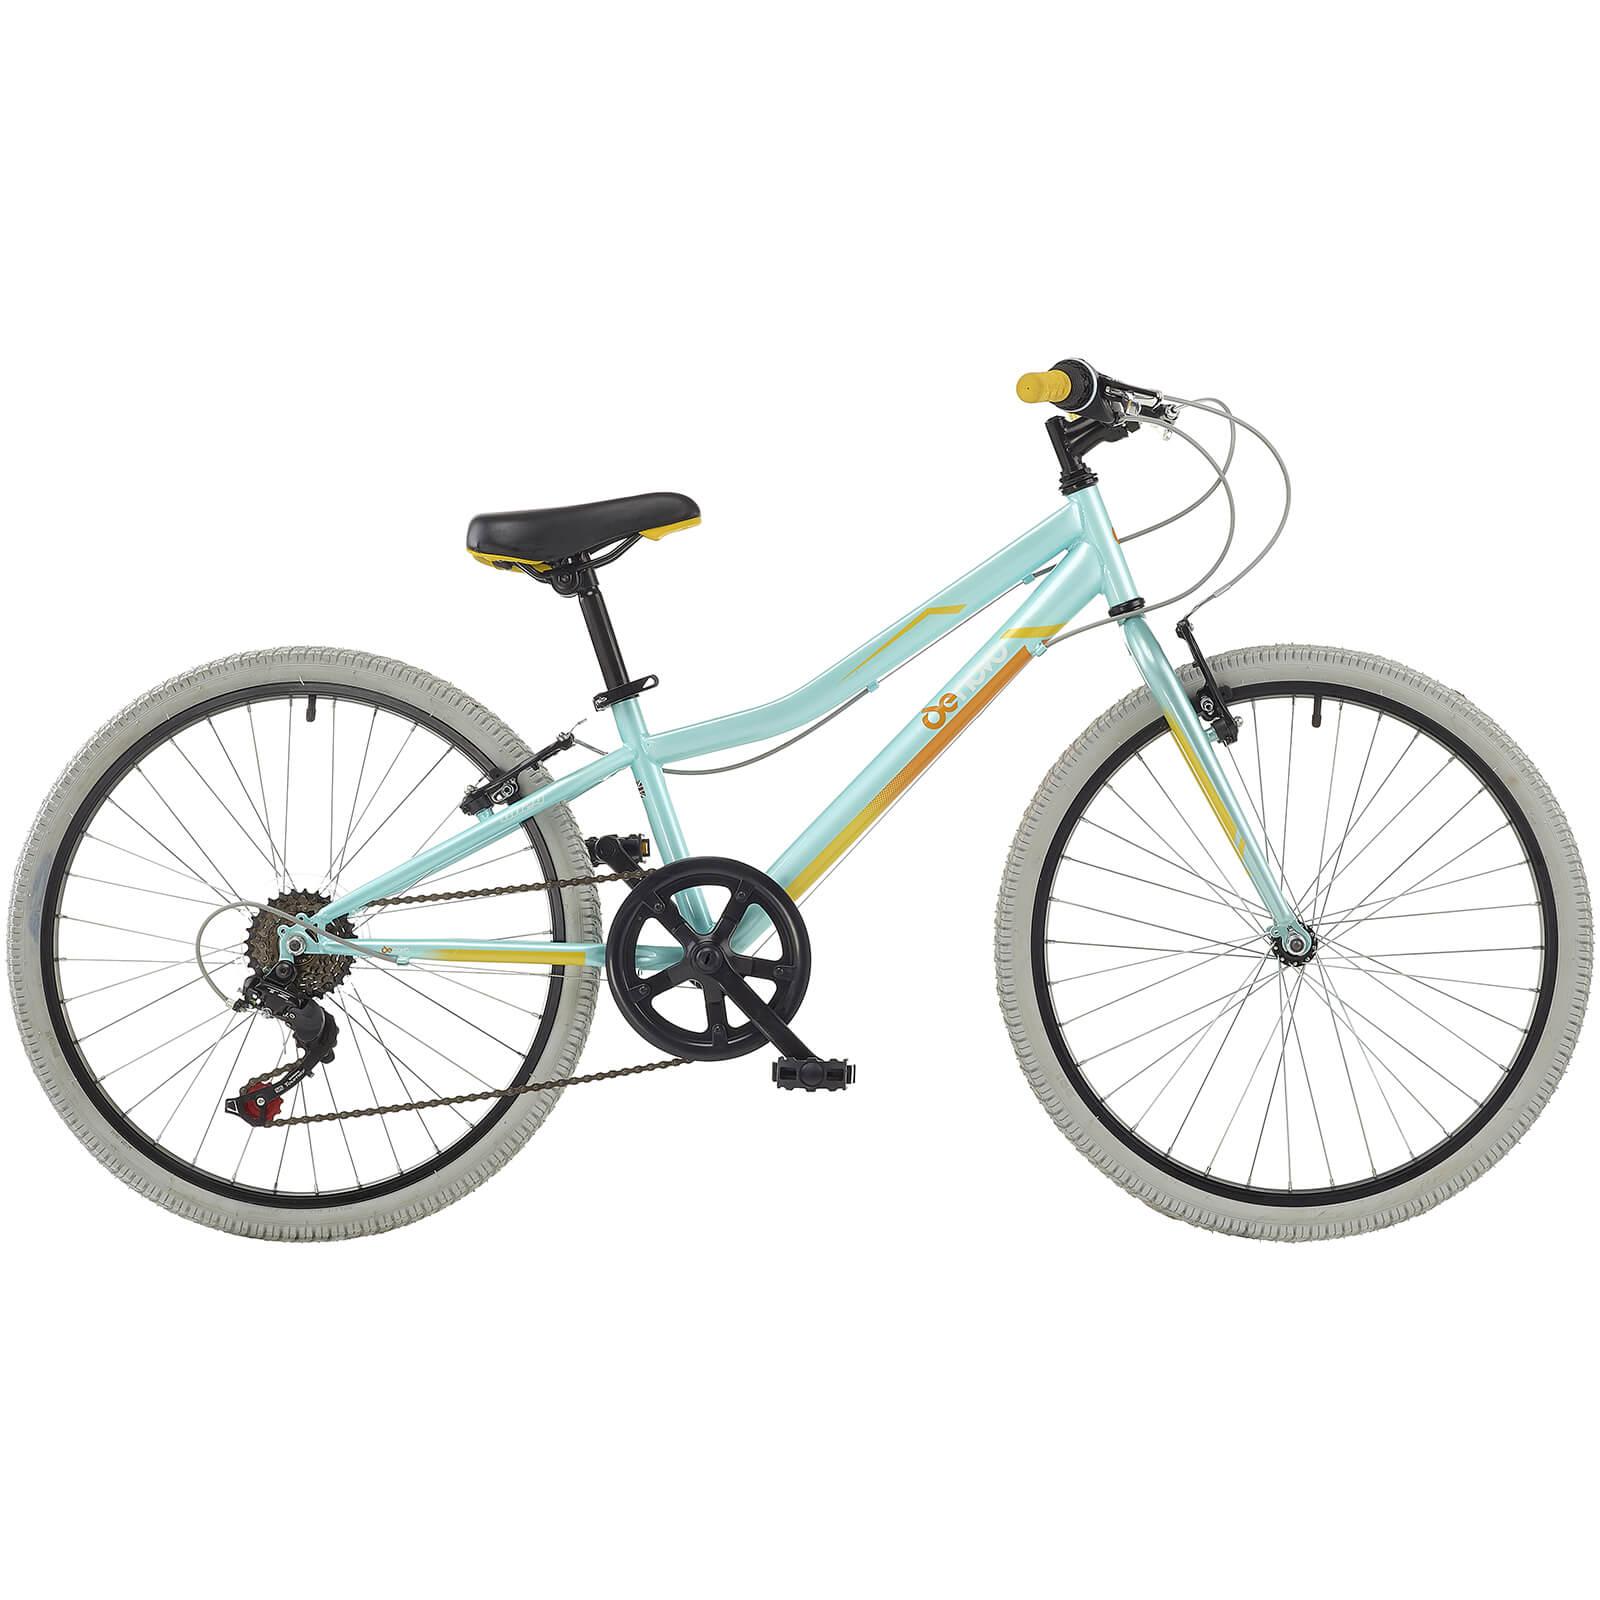 Denovo Girls Bike 24 Wheel Insync Bikes